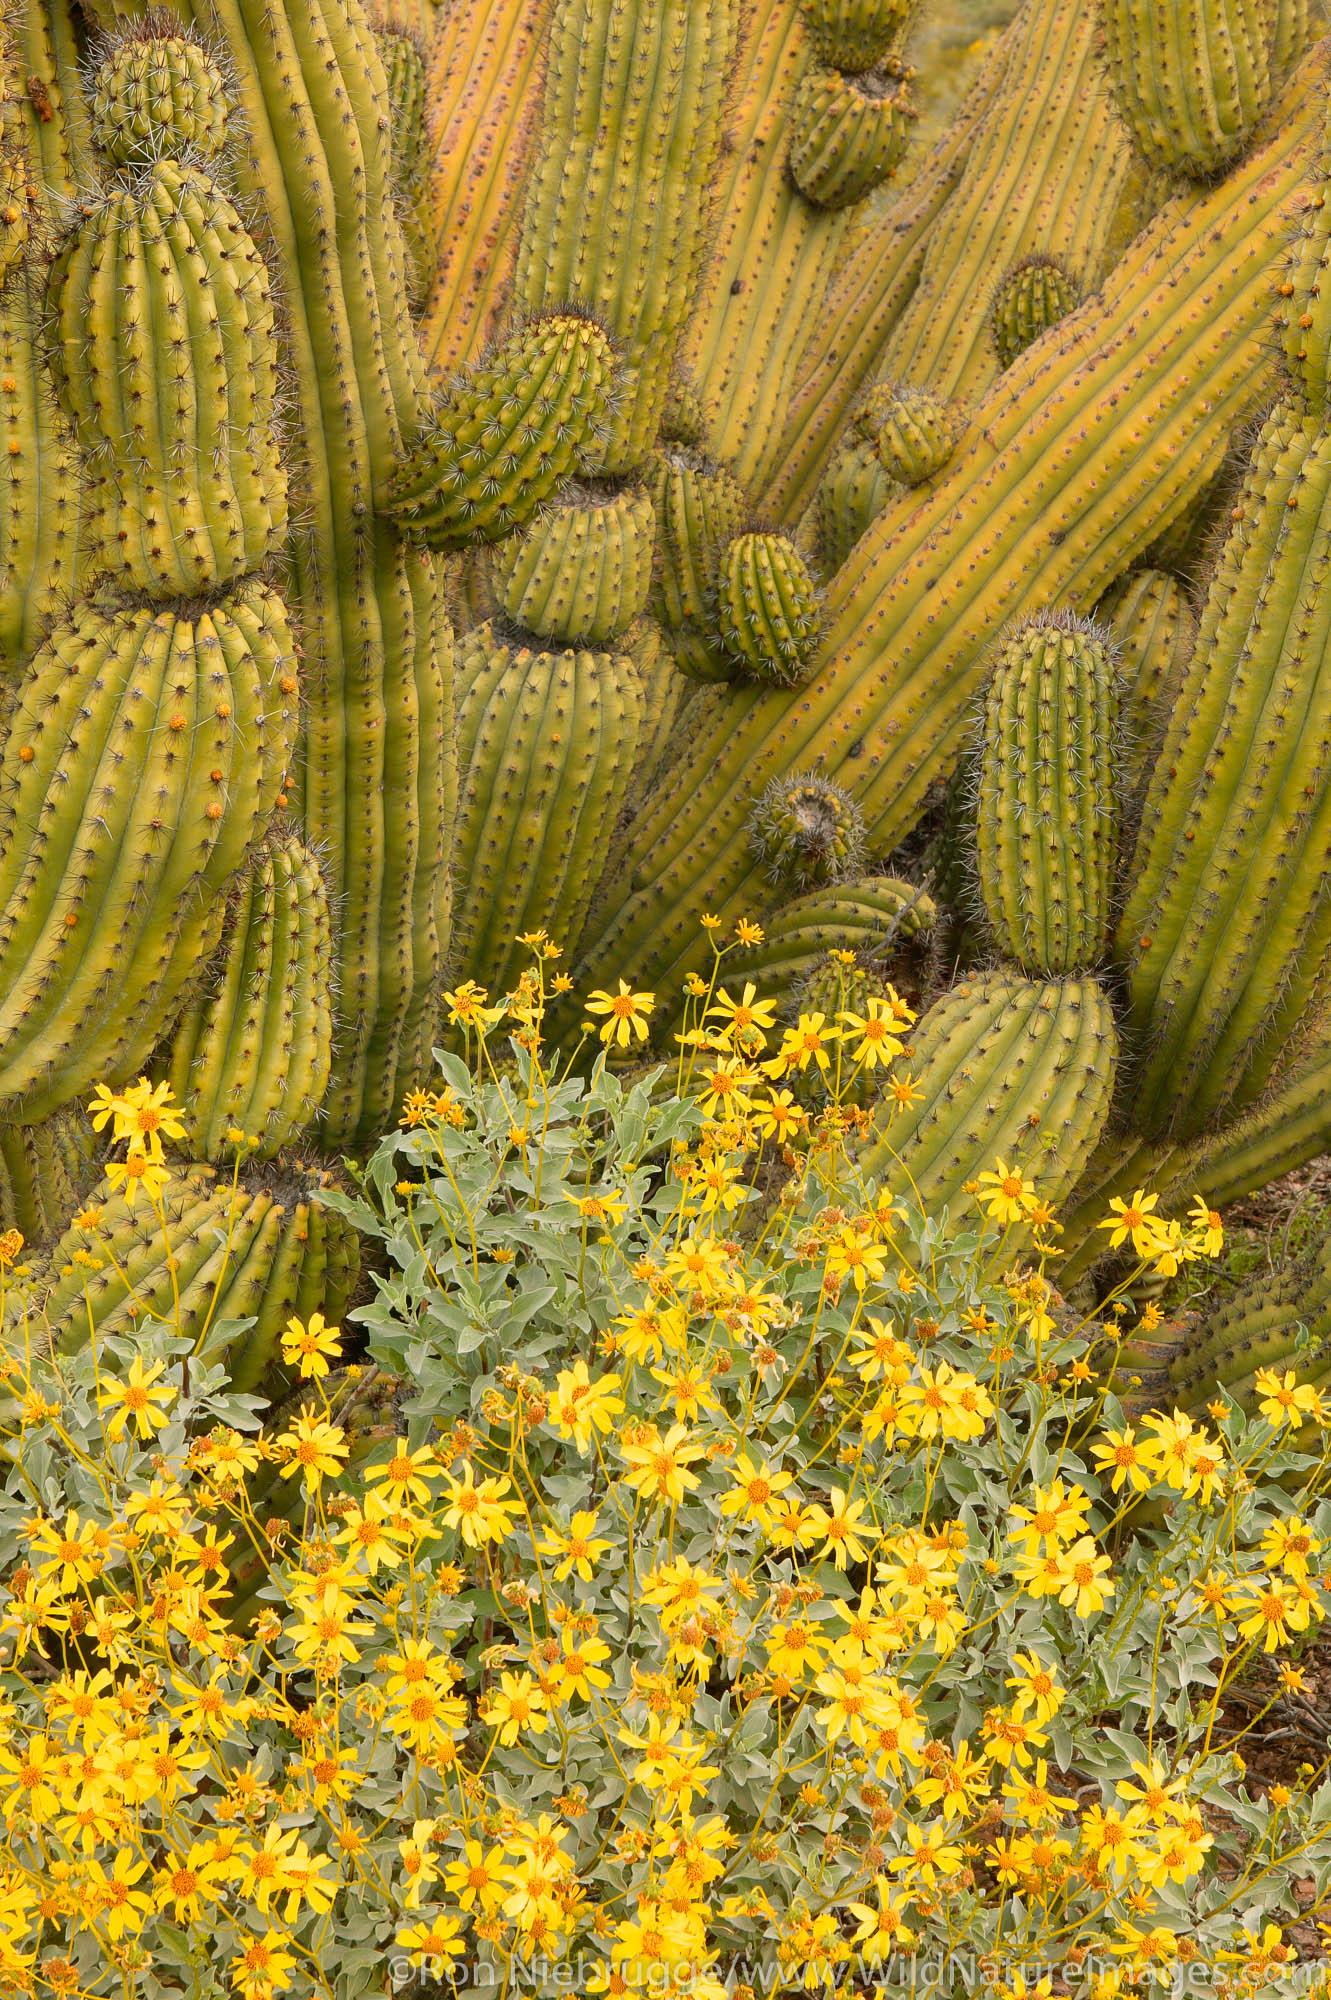 Organ Pipe Cactus (Stenocereus thurberi), Organ Pipe Cactus National Monument, Arizona.